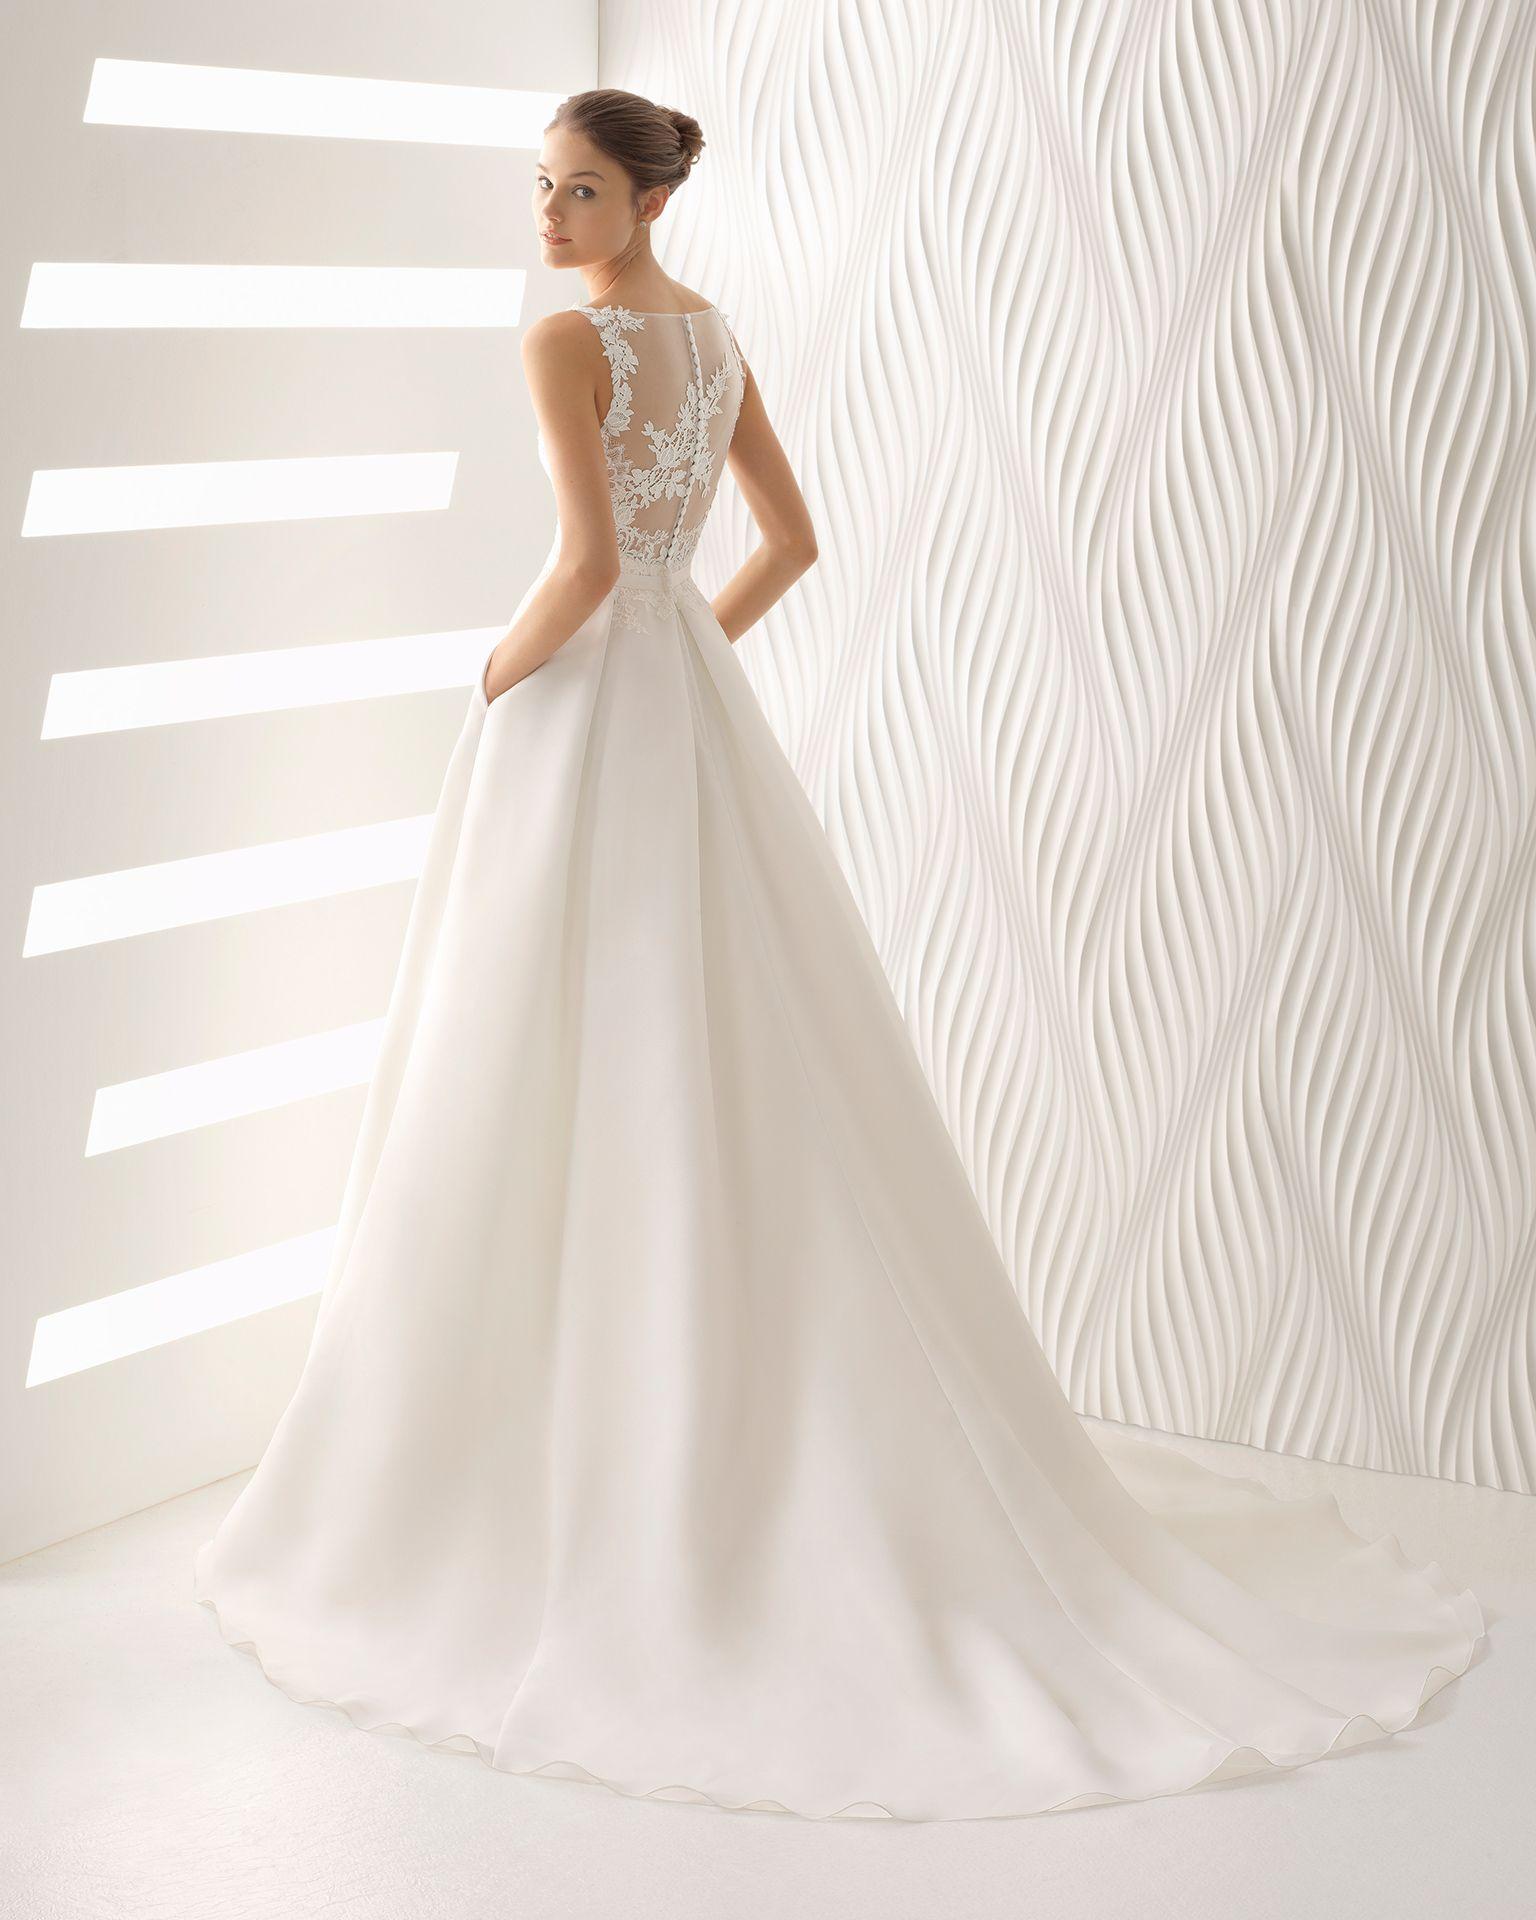 Antoinerosaclarag wedding dress